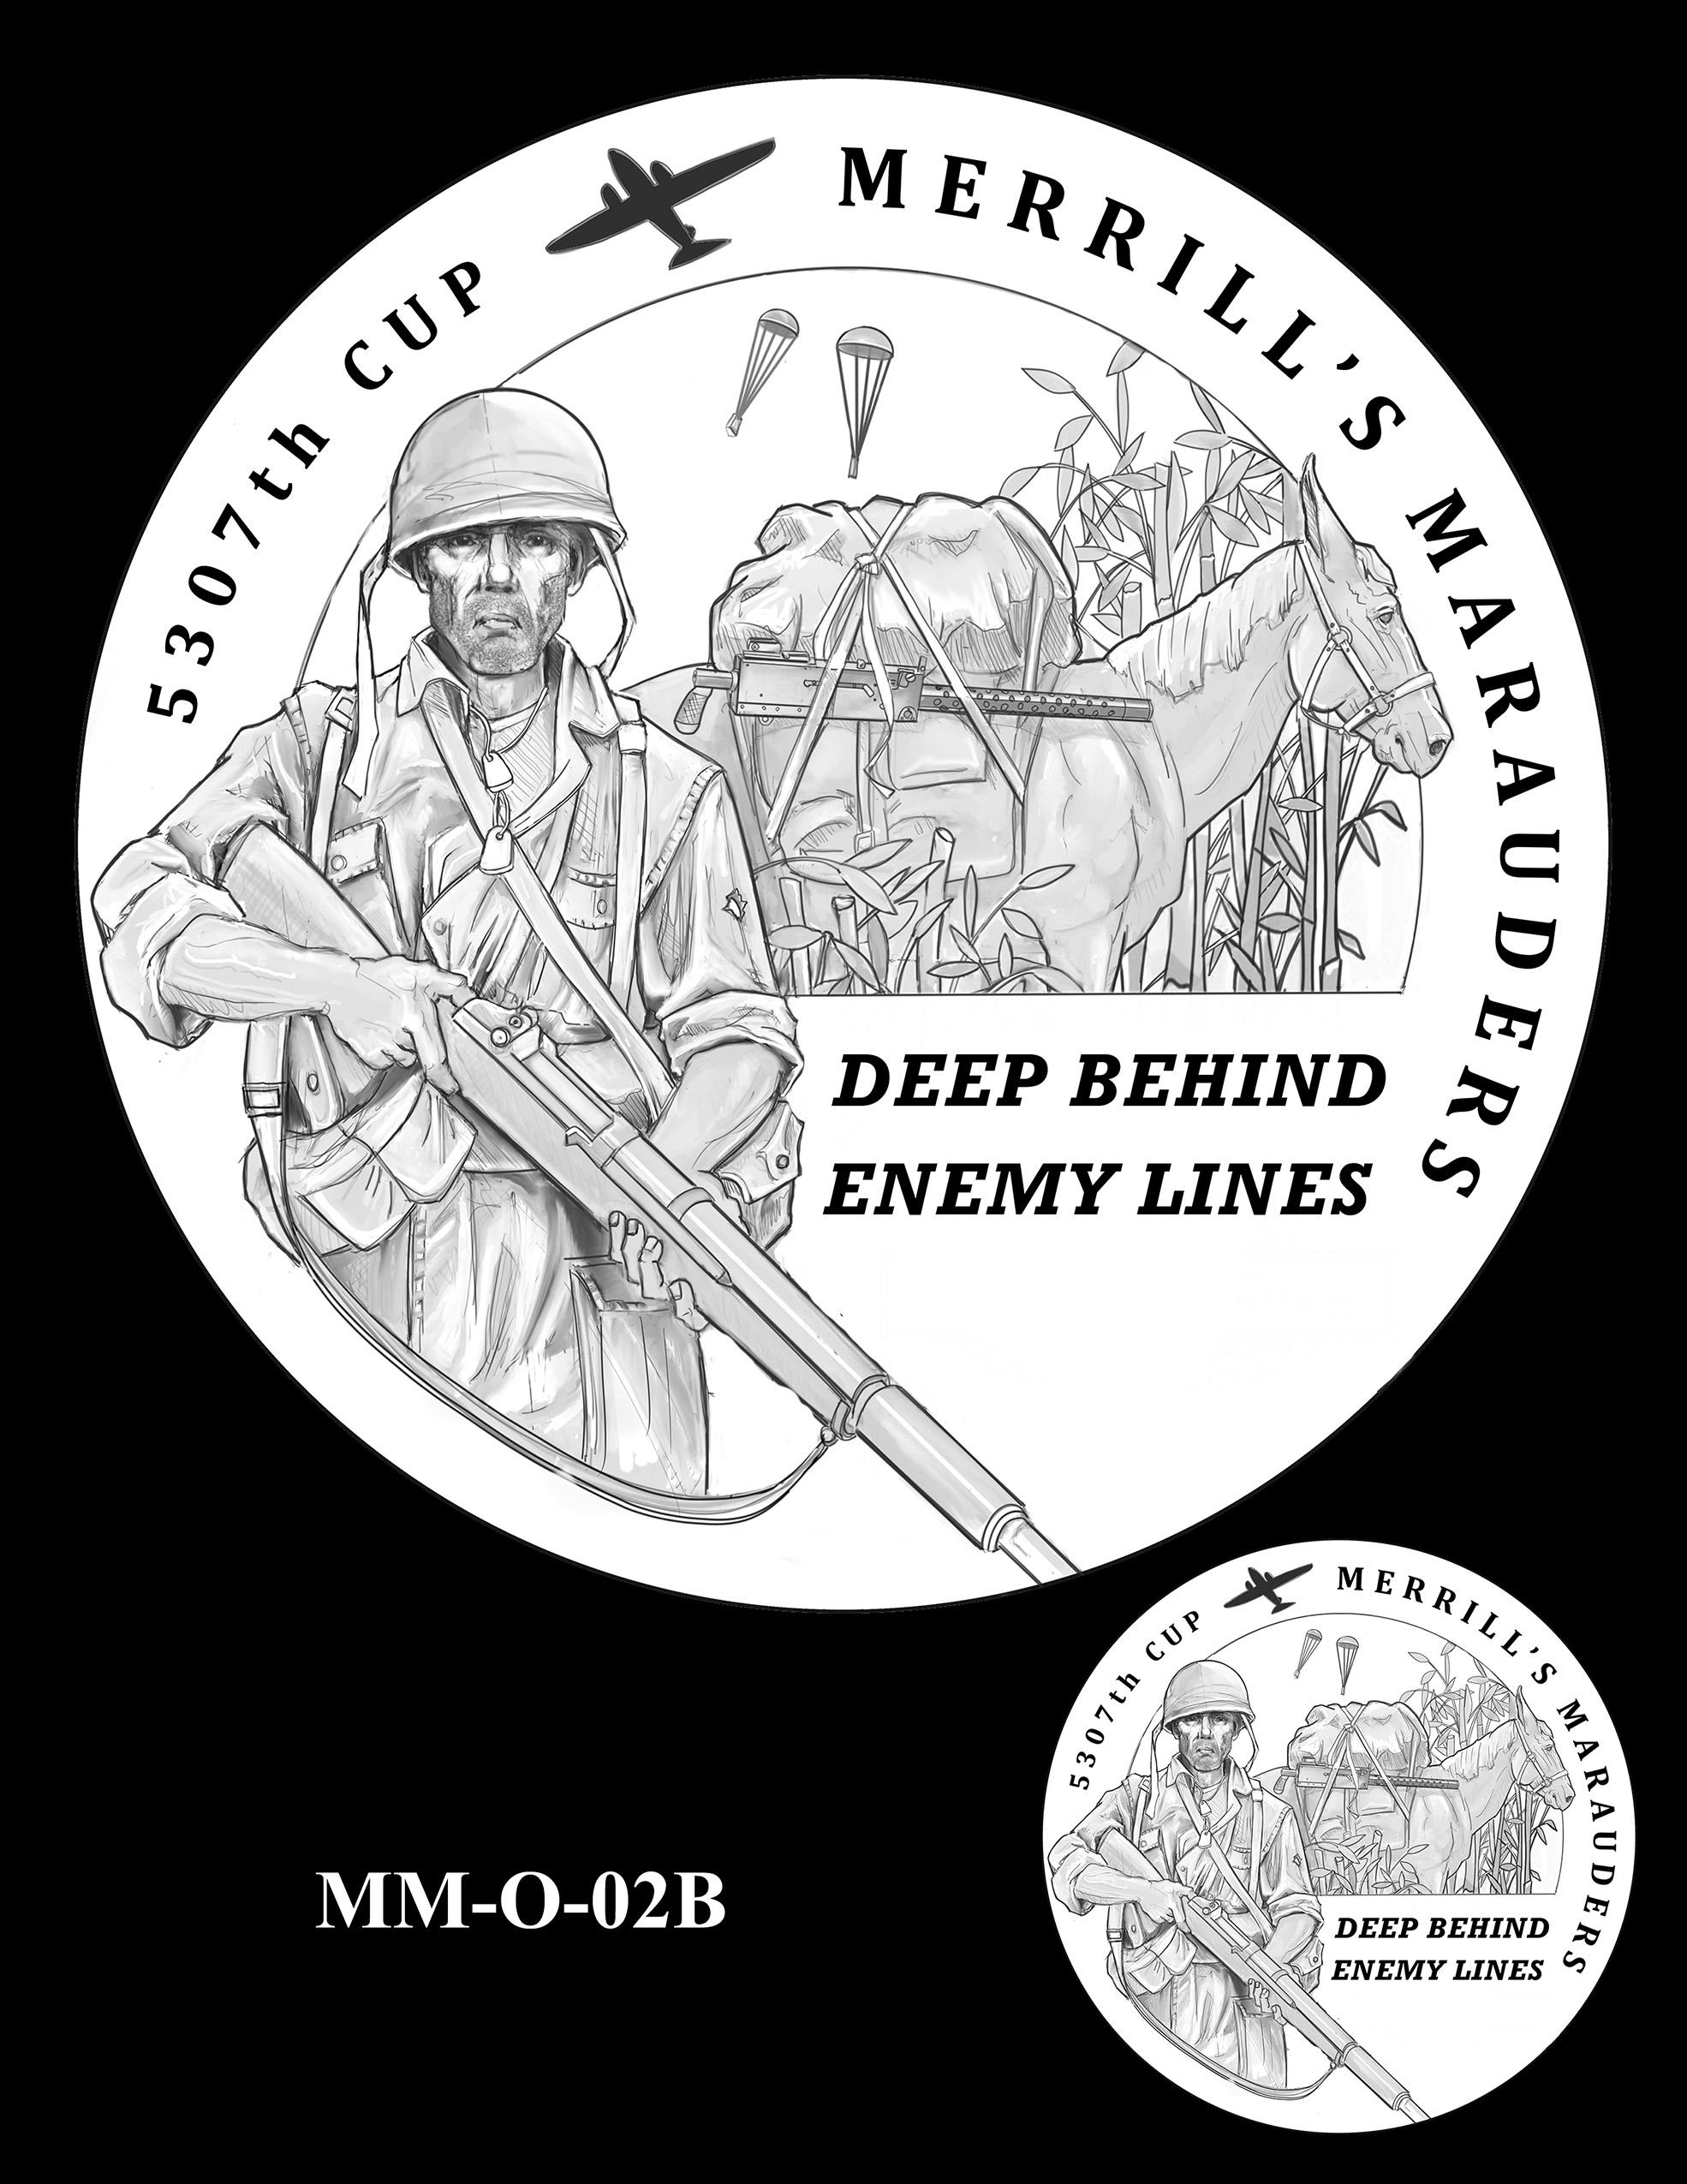 MM-O-02B -- Merrill's Marauders Congressional Gold Medal